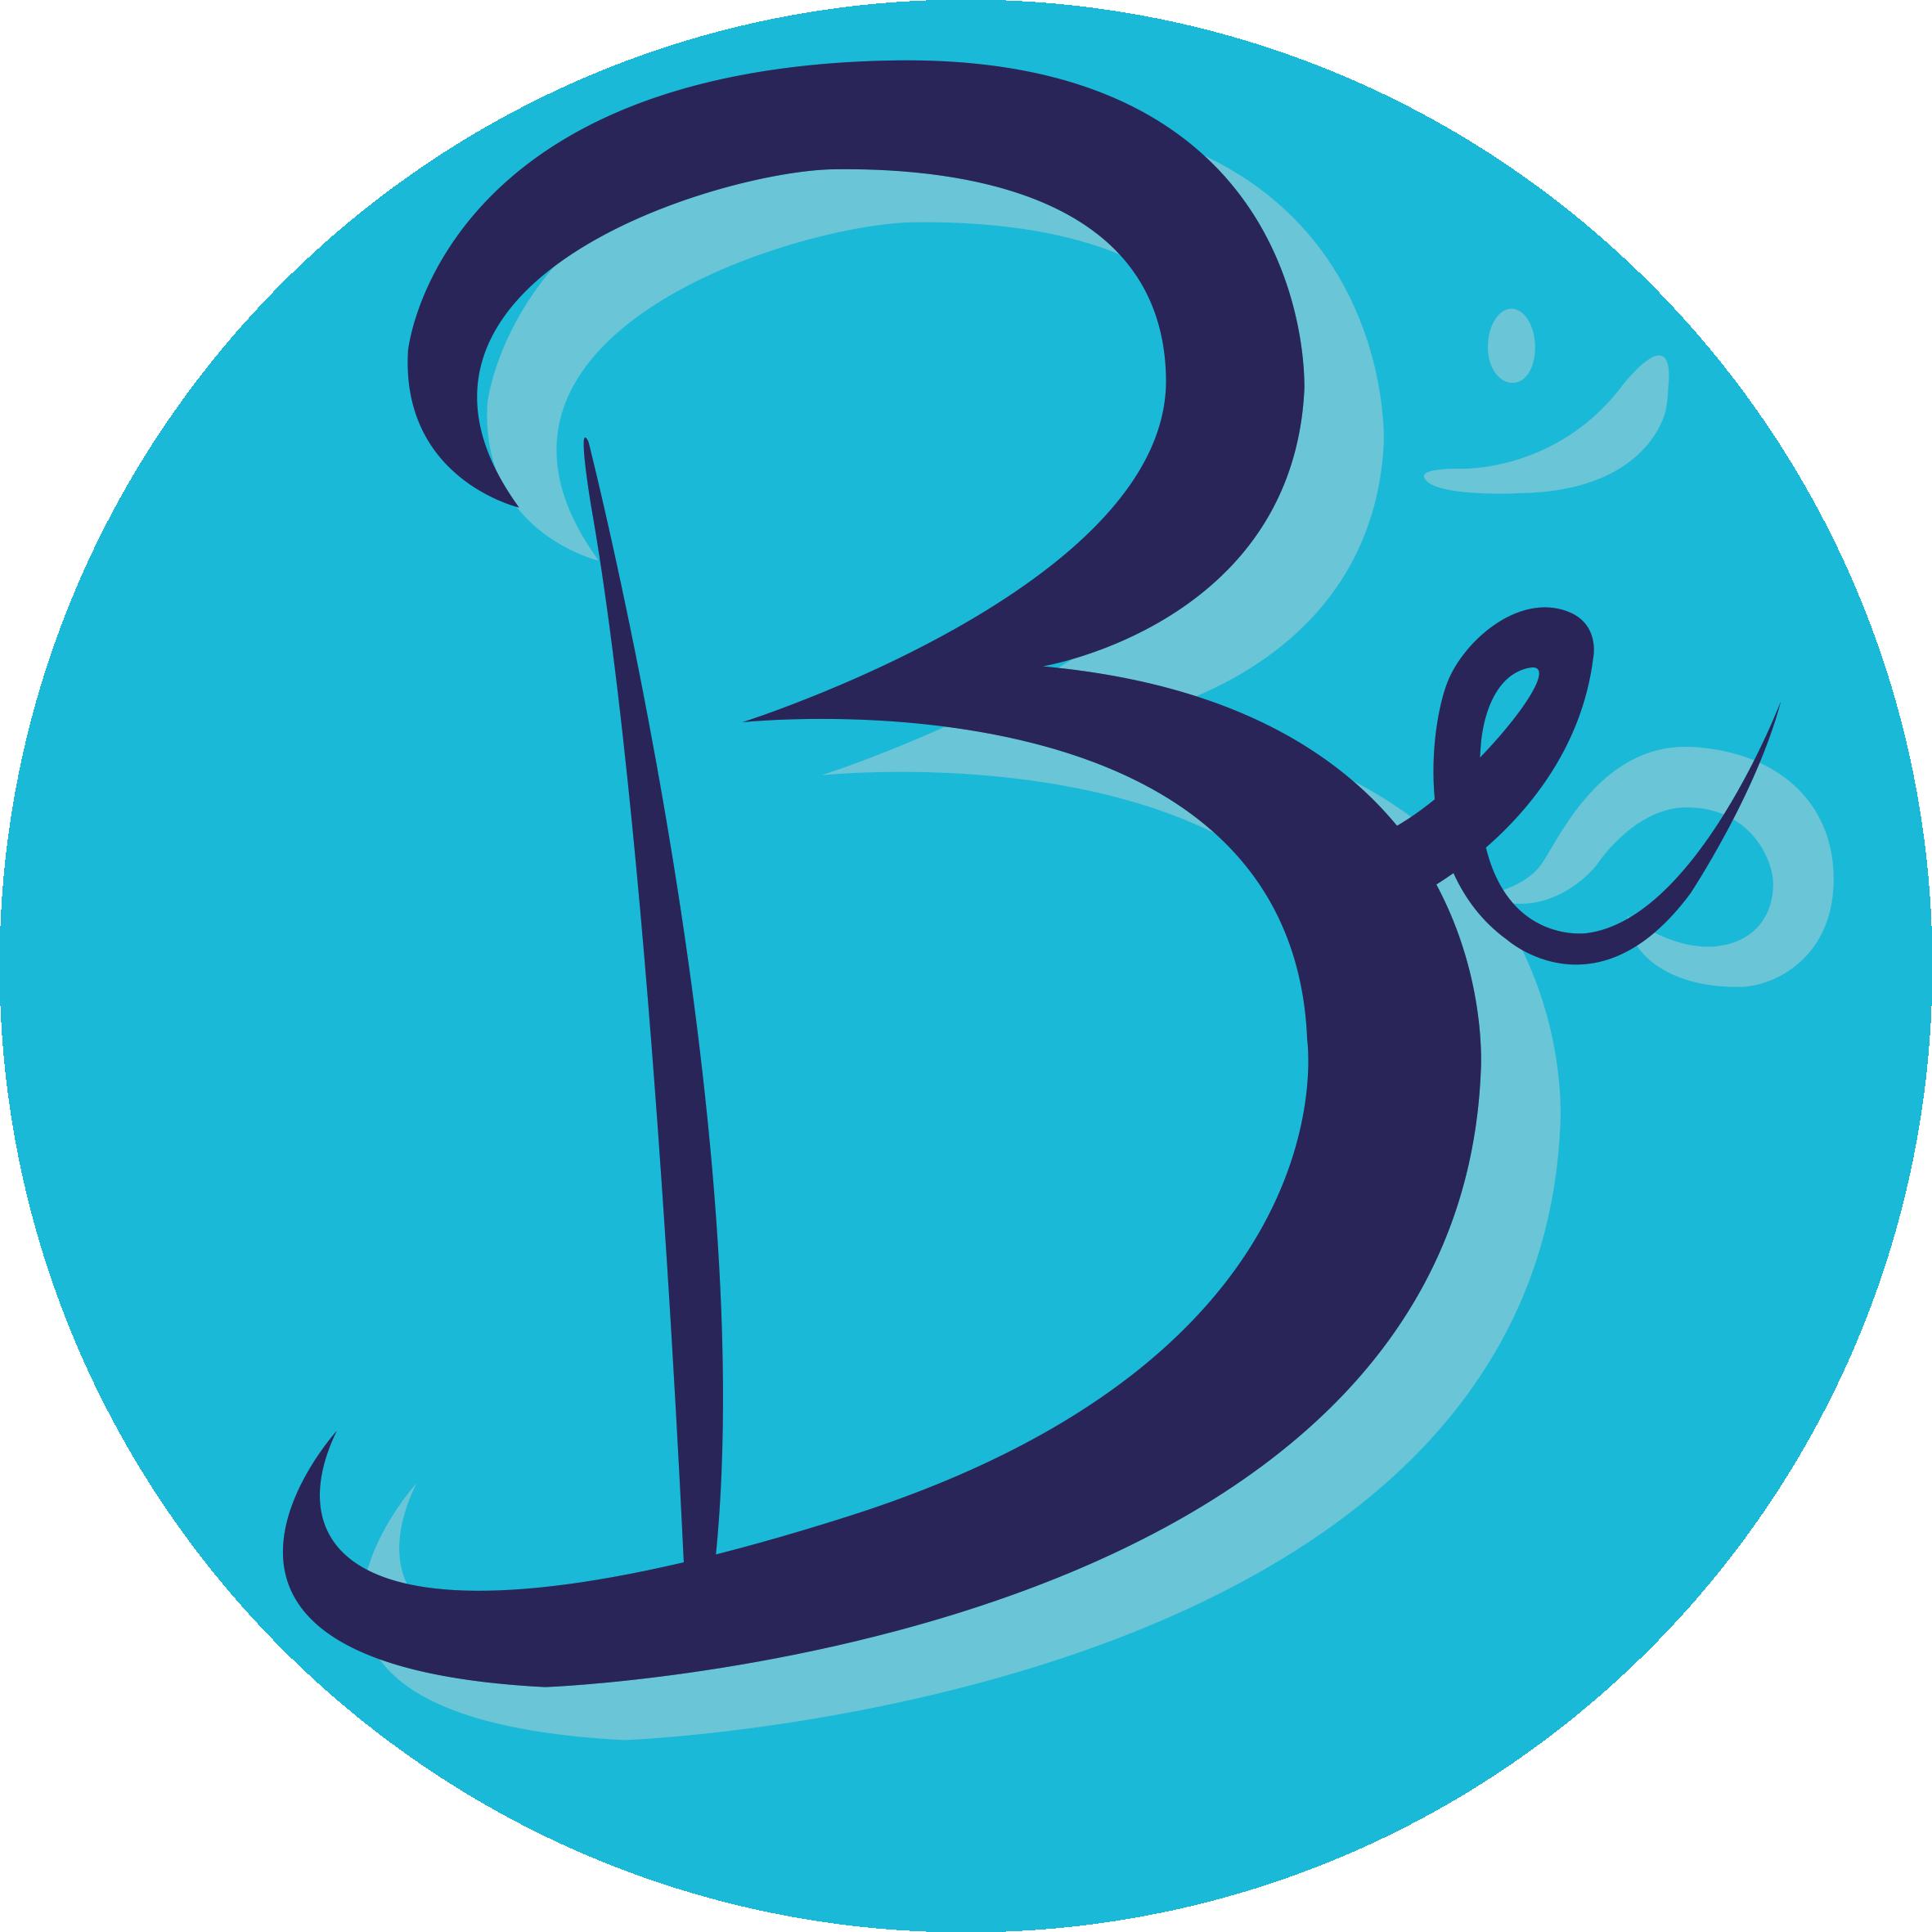 beyoga-logo-blue.png